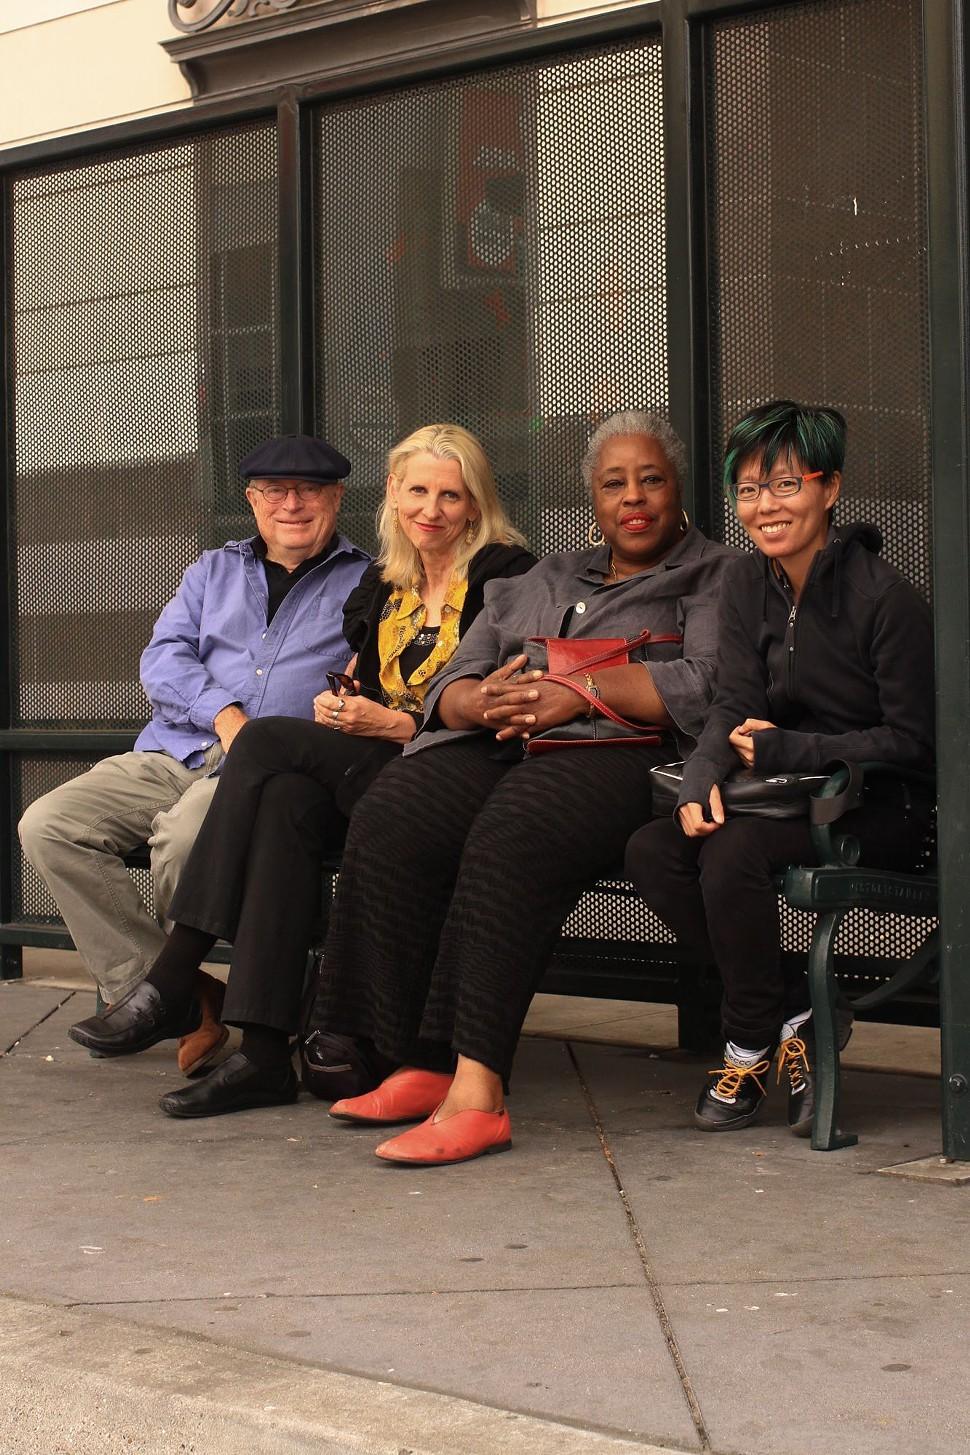 Peter Richards, Johanna Poethig, Mildred Howard, and Joyce Hsu